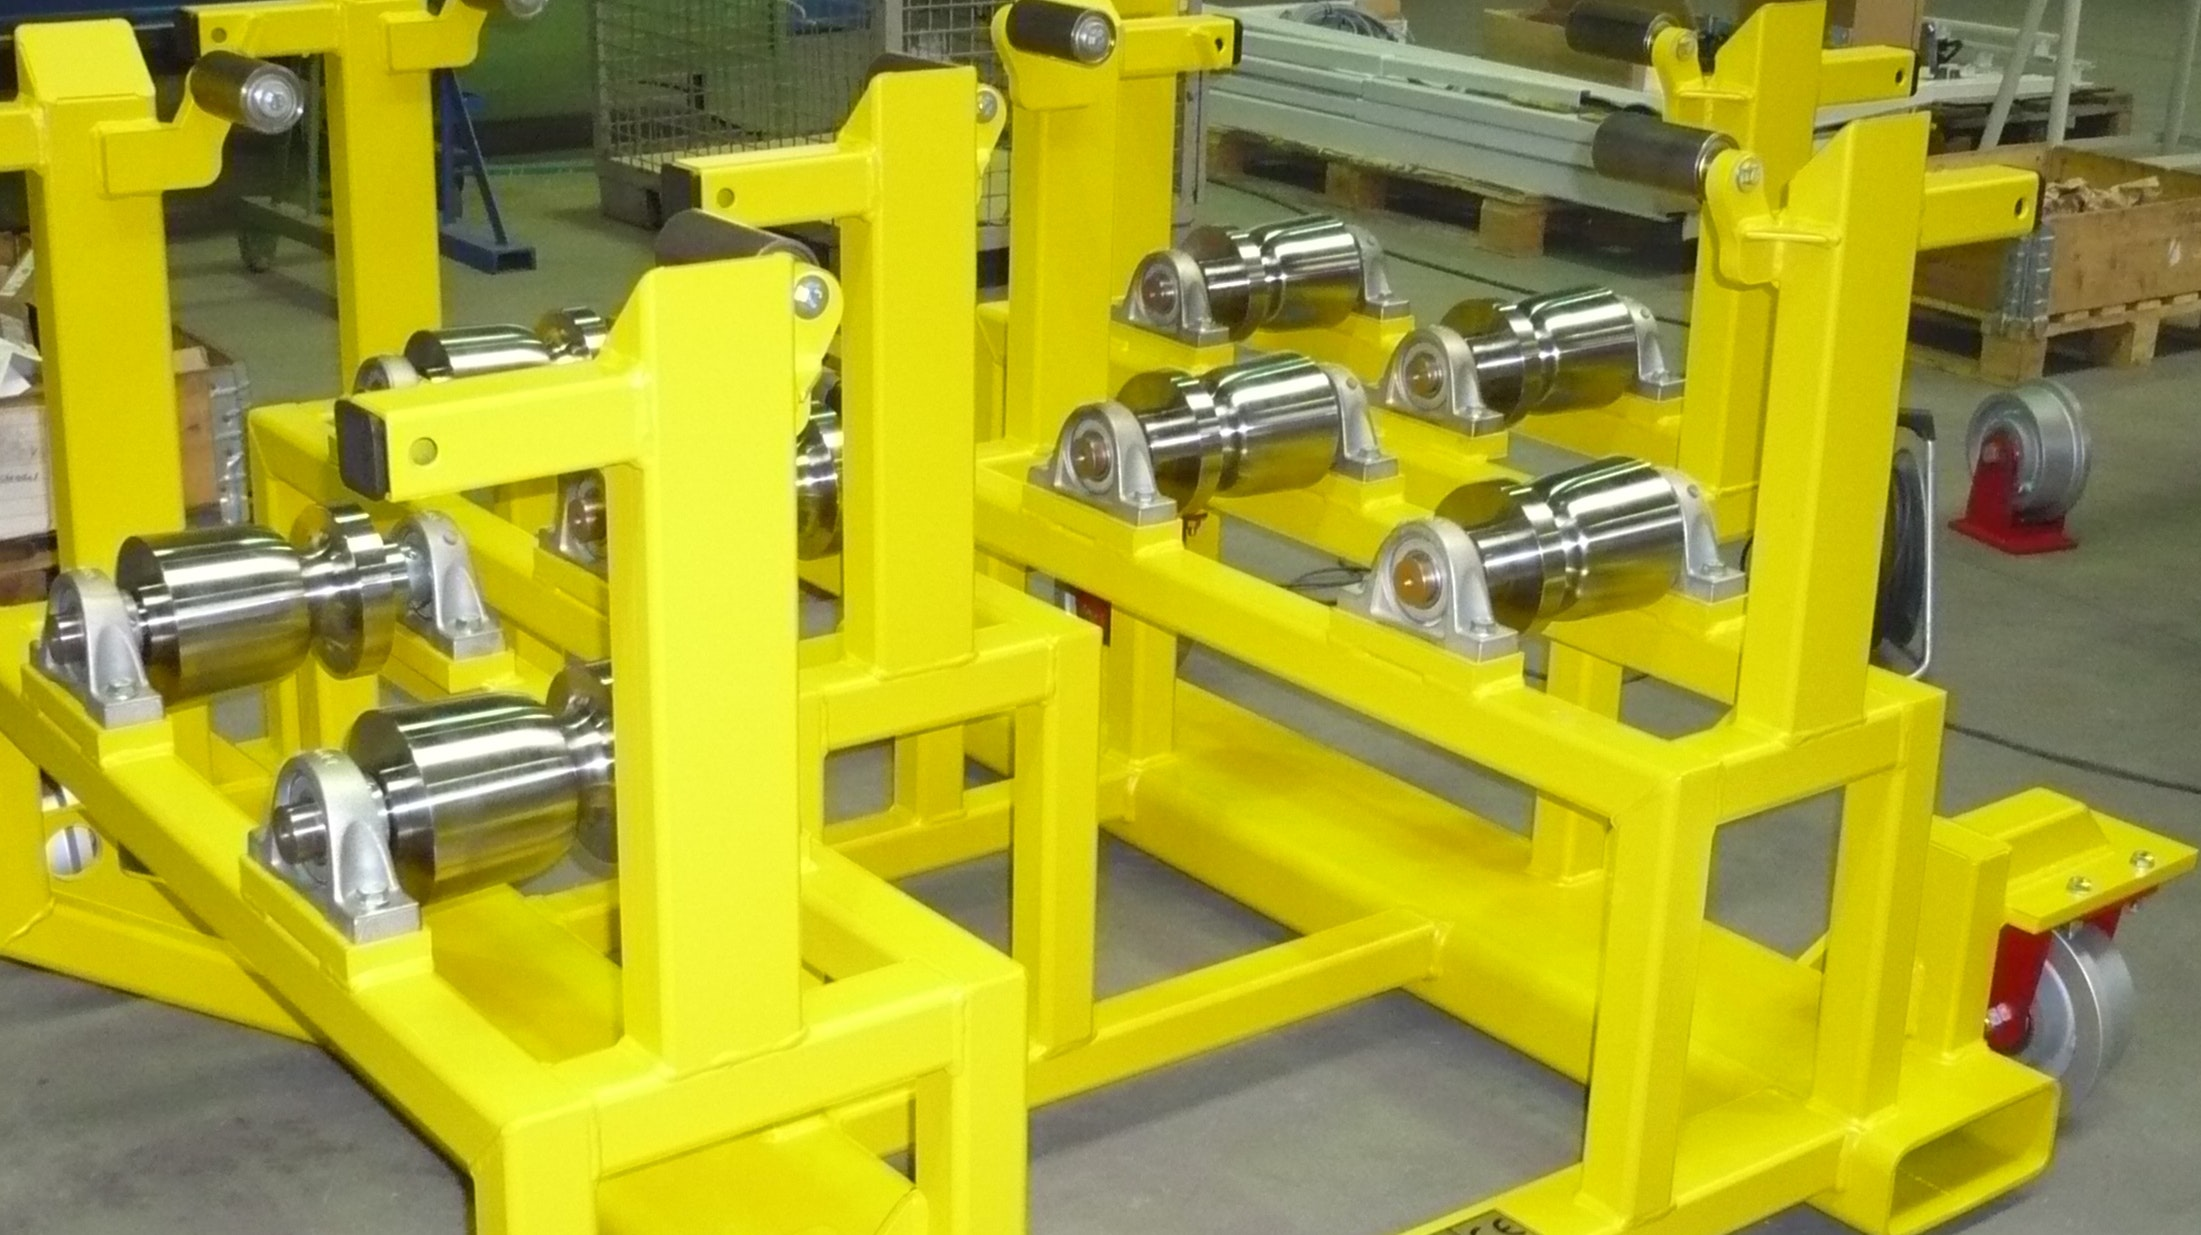 Transport rack for wheel discs suitable for rail transport